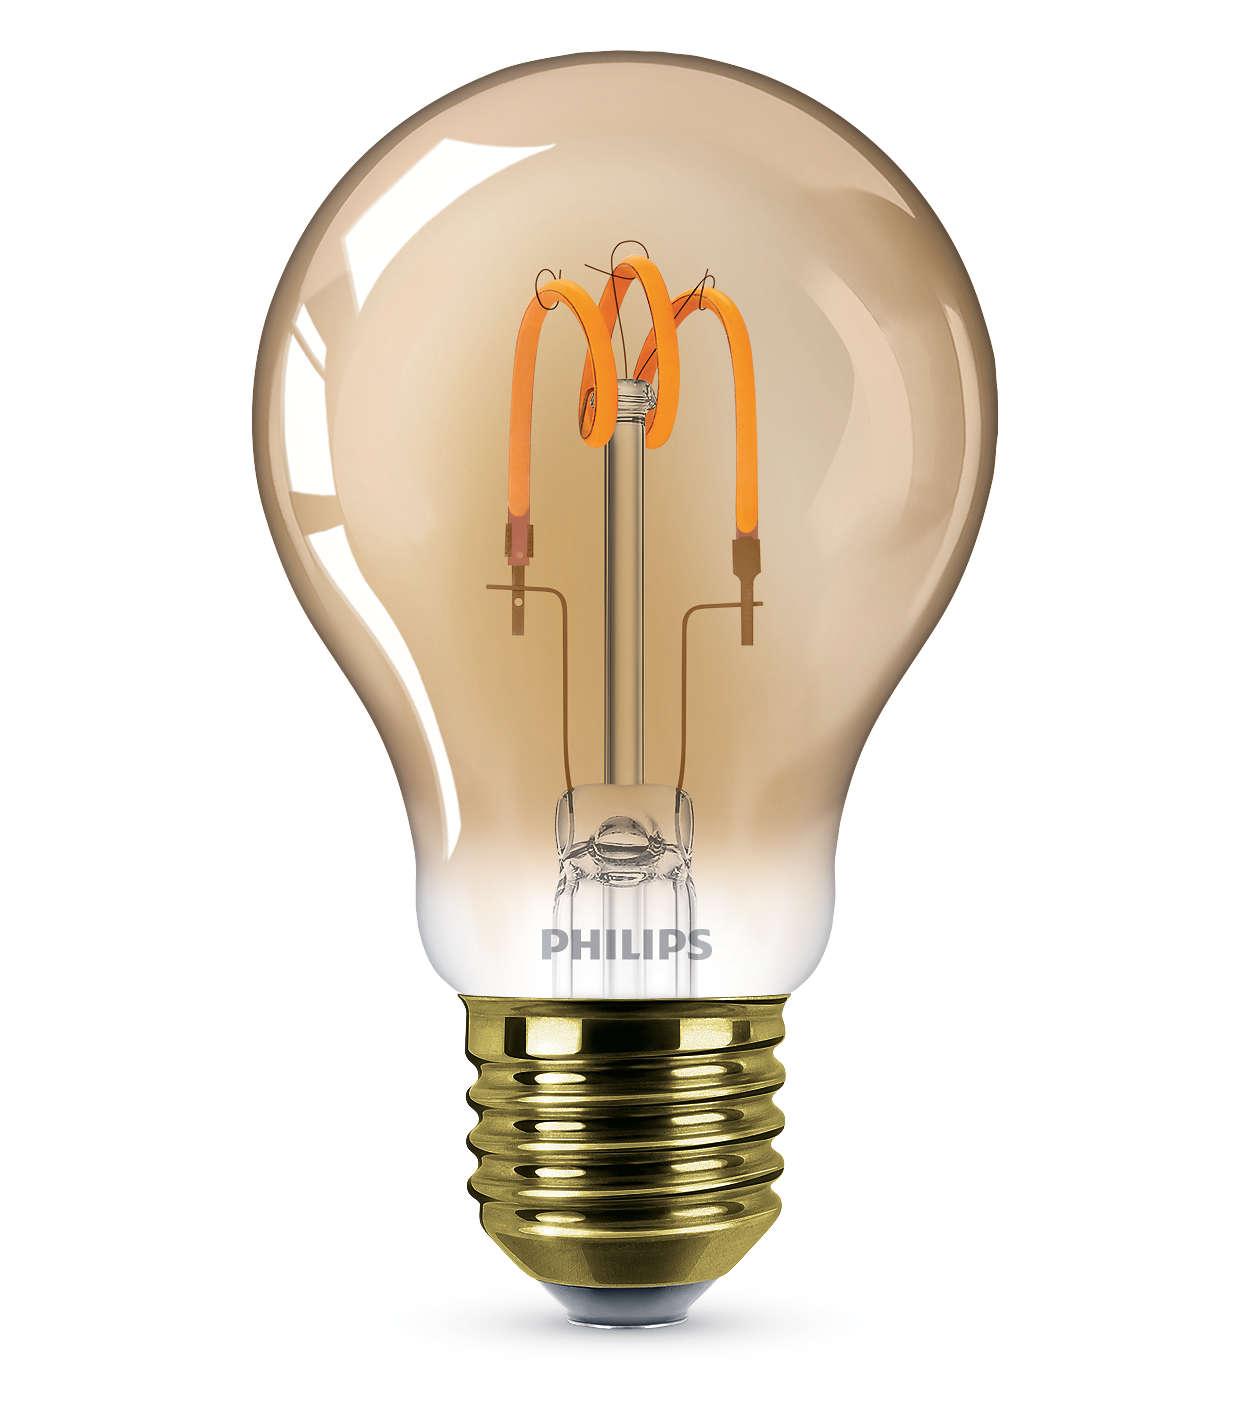 LED Lampe 8718696743034 | Philips